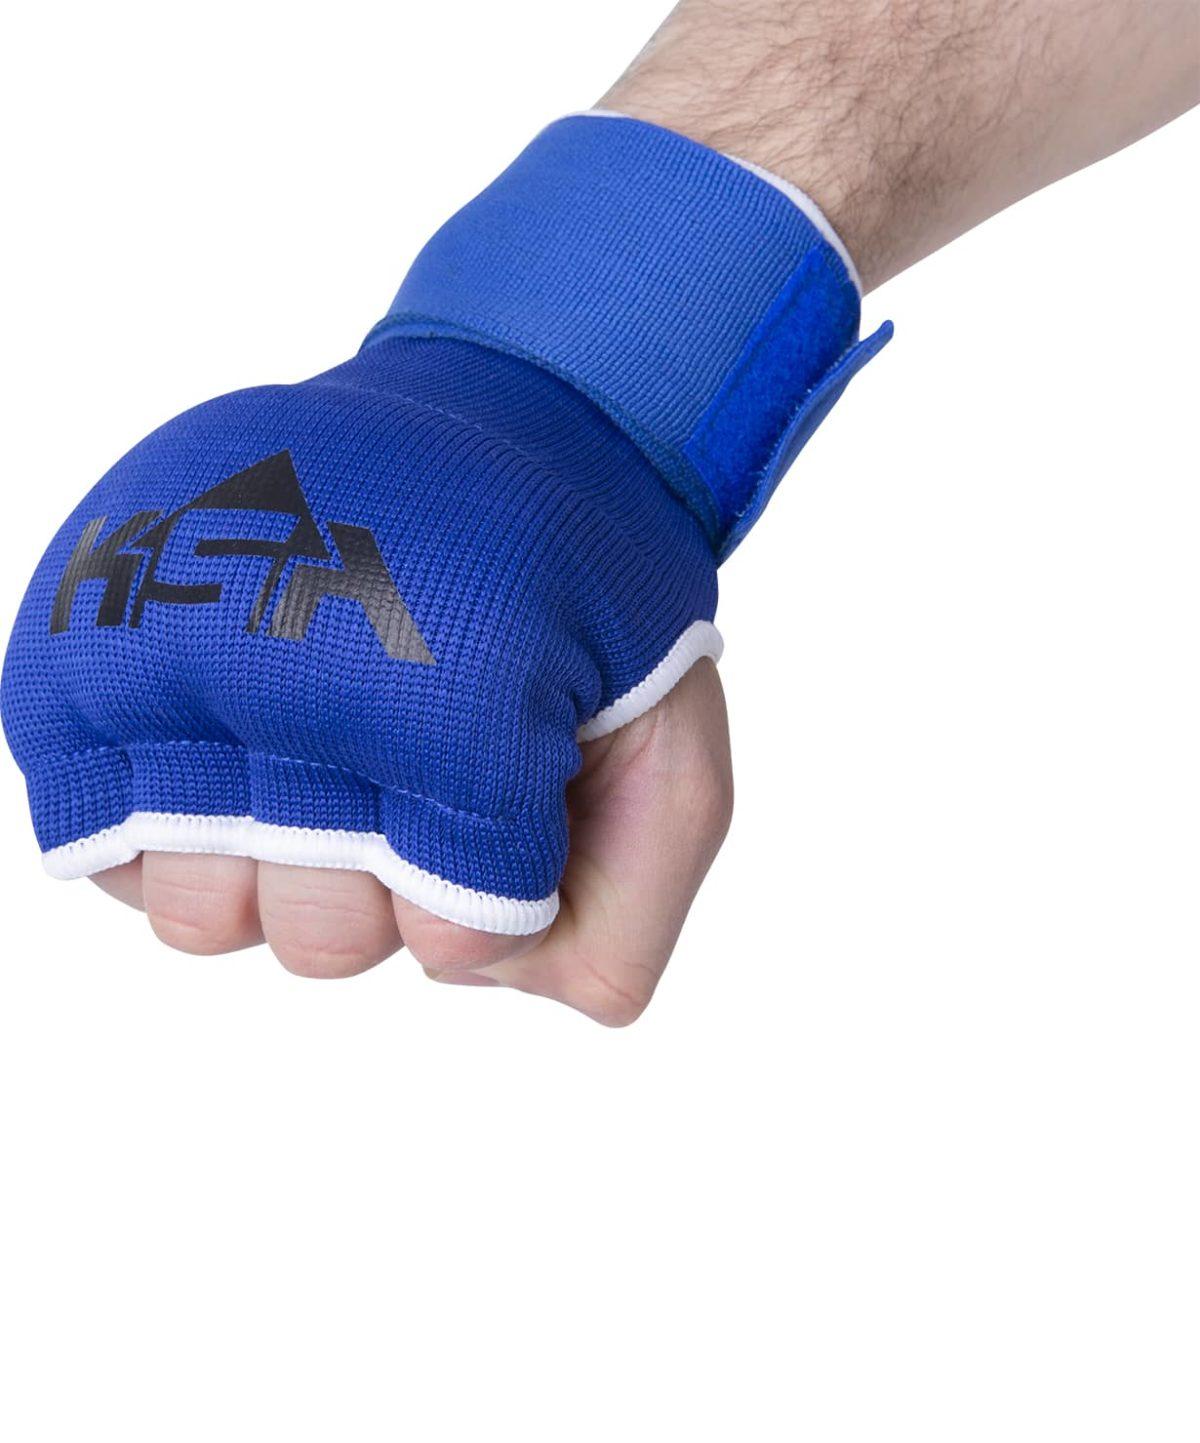 KSA Cobra перчатки внутренние для бокса 17899: синий - 3